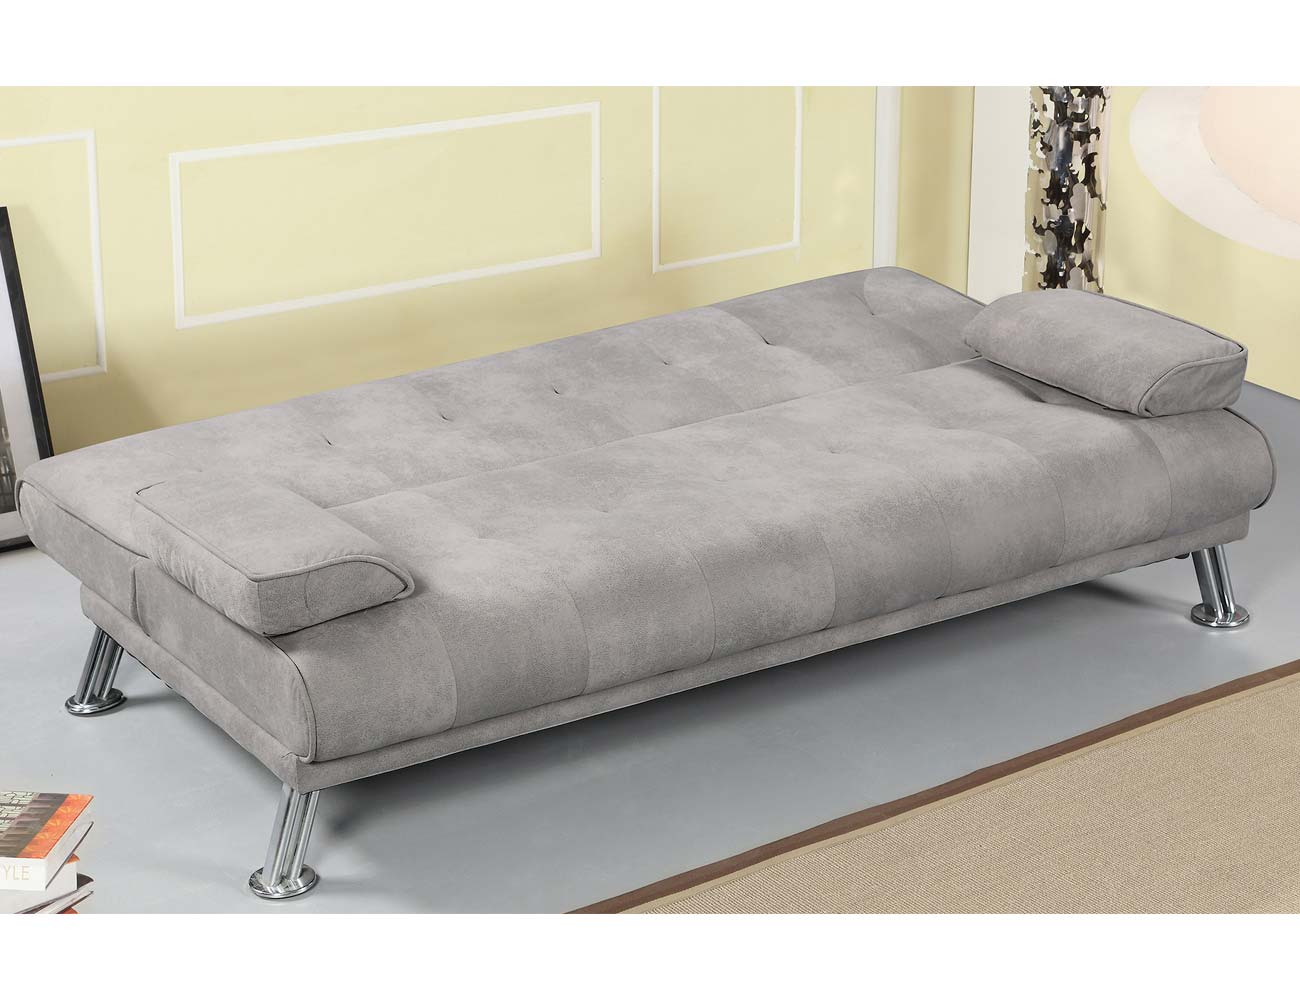 Sofa clic clac tapizado gris marengo patas cromadas abierto